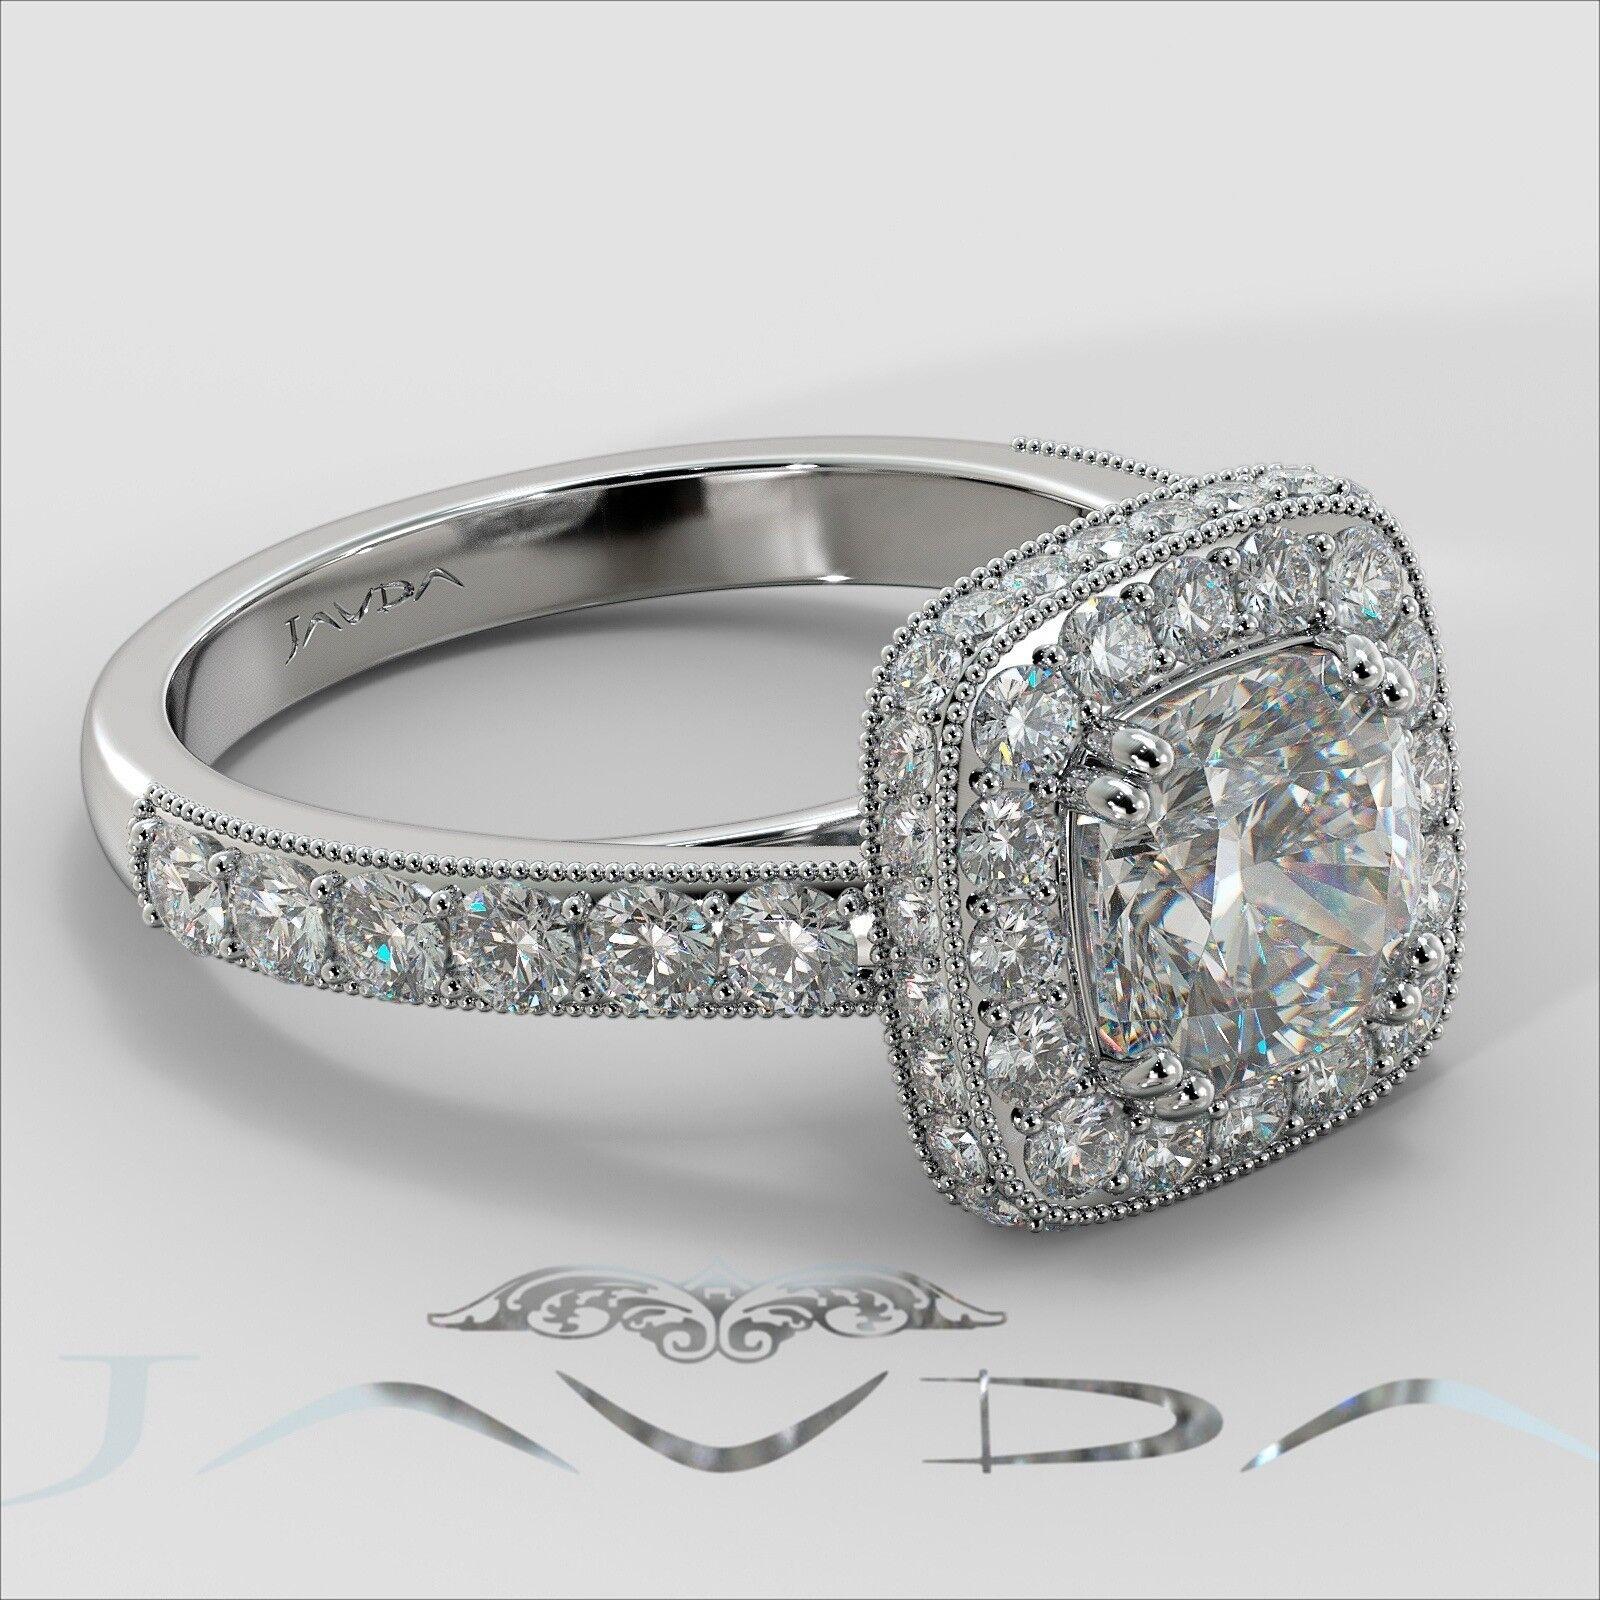 1.94ctw Milgrain Floral Basket Cushion Diamond Engagement Ring GIA E-VVS1 W Gold 2